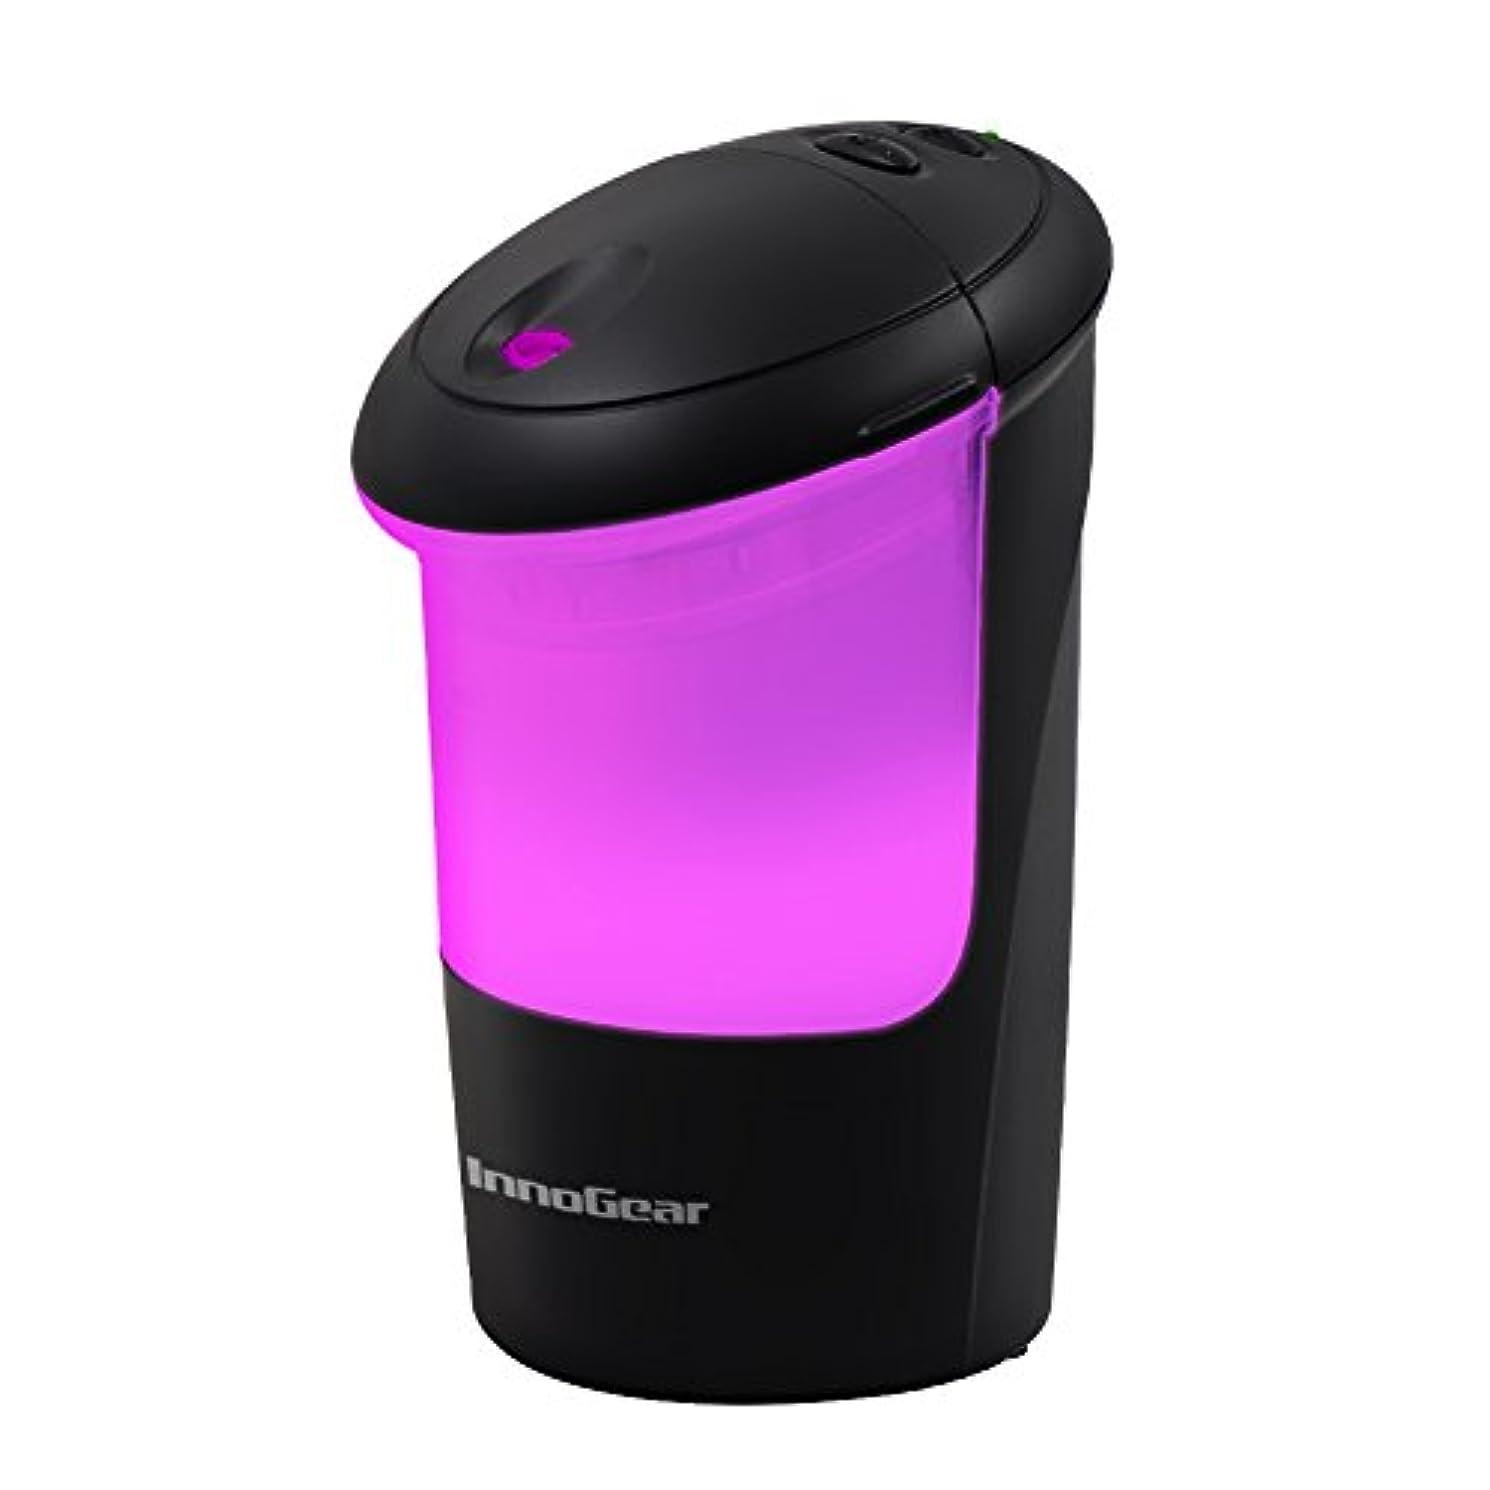 InnoGear USB車Essential Oil Diffuser Air Refresher超音波アロマテラピーDiffusers with 7カラフルなLEDライトオフィス旅行ホーム車の ブラック UD50